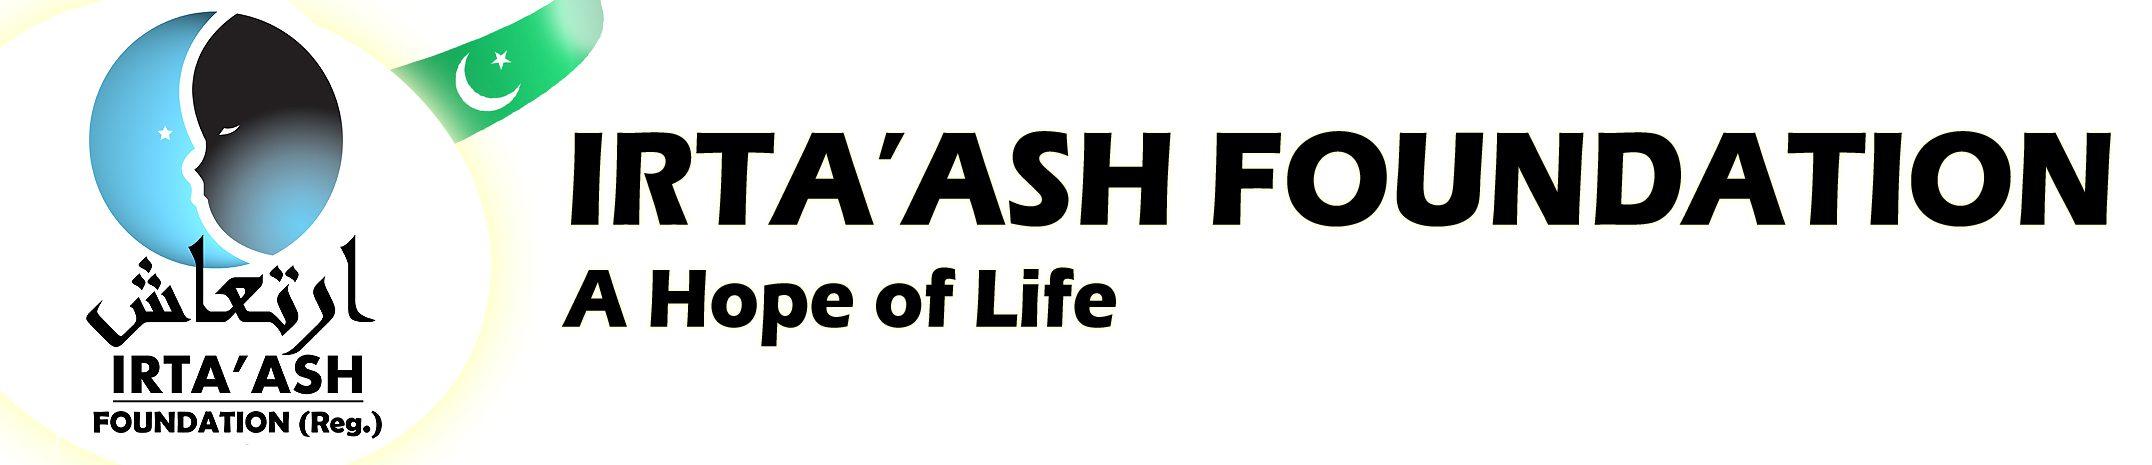 Irta'ash Foundation